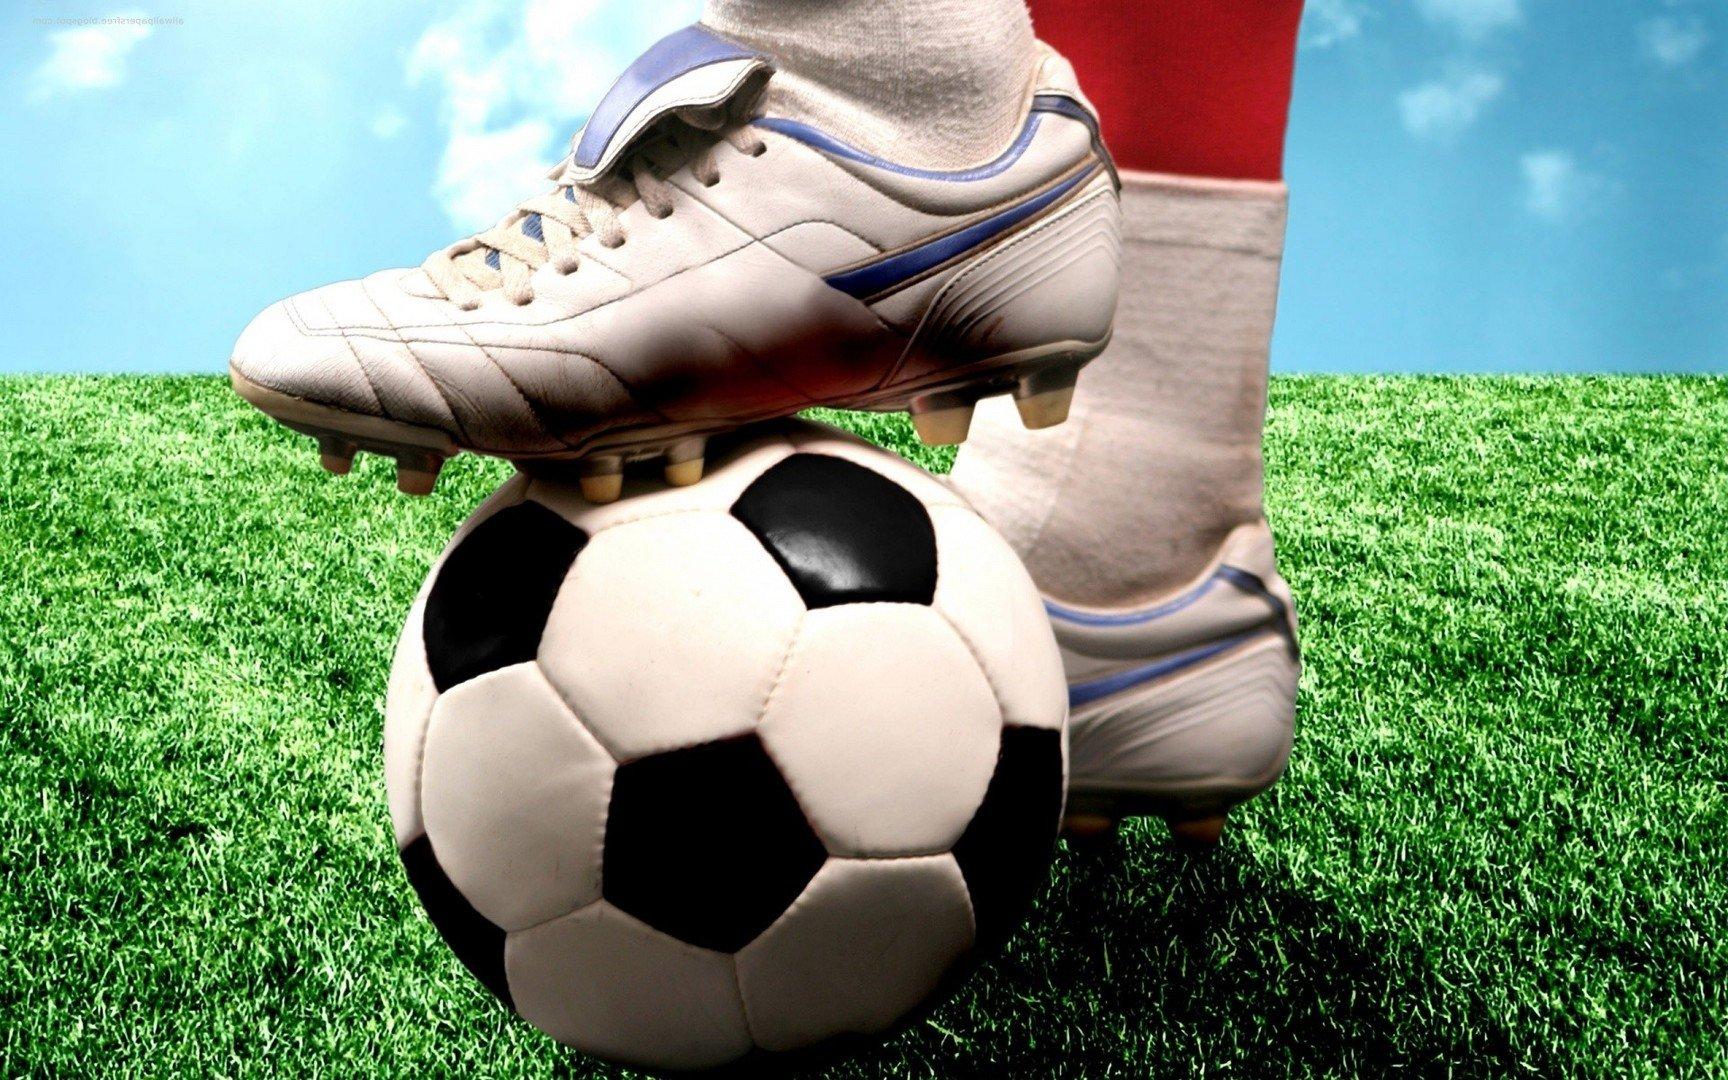 American Football 1080p: Football HD Wallpapers 1080p